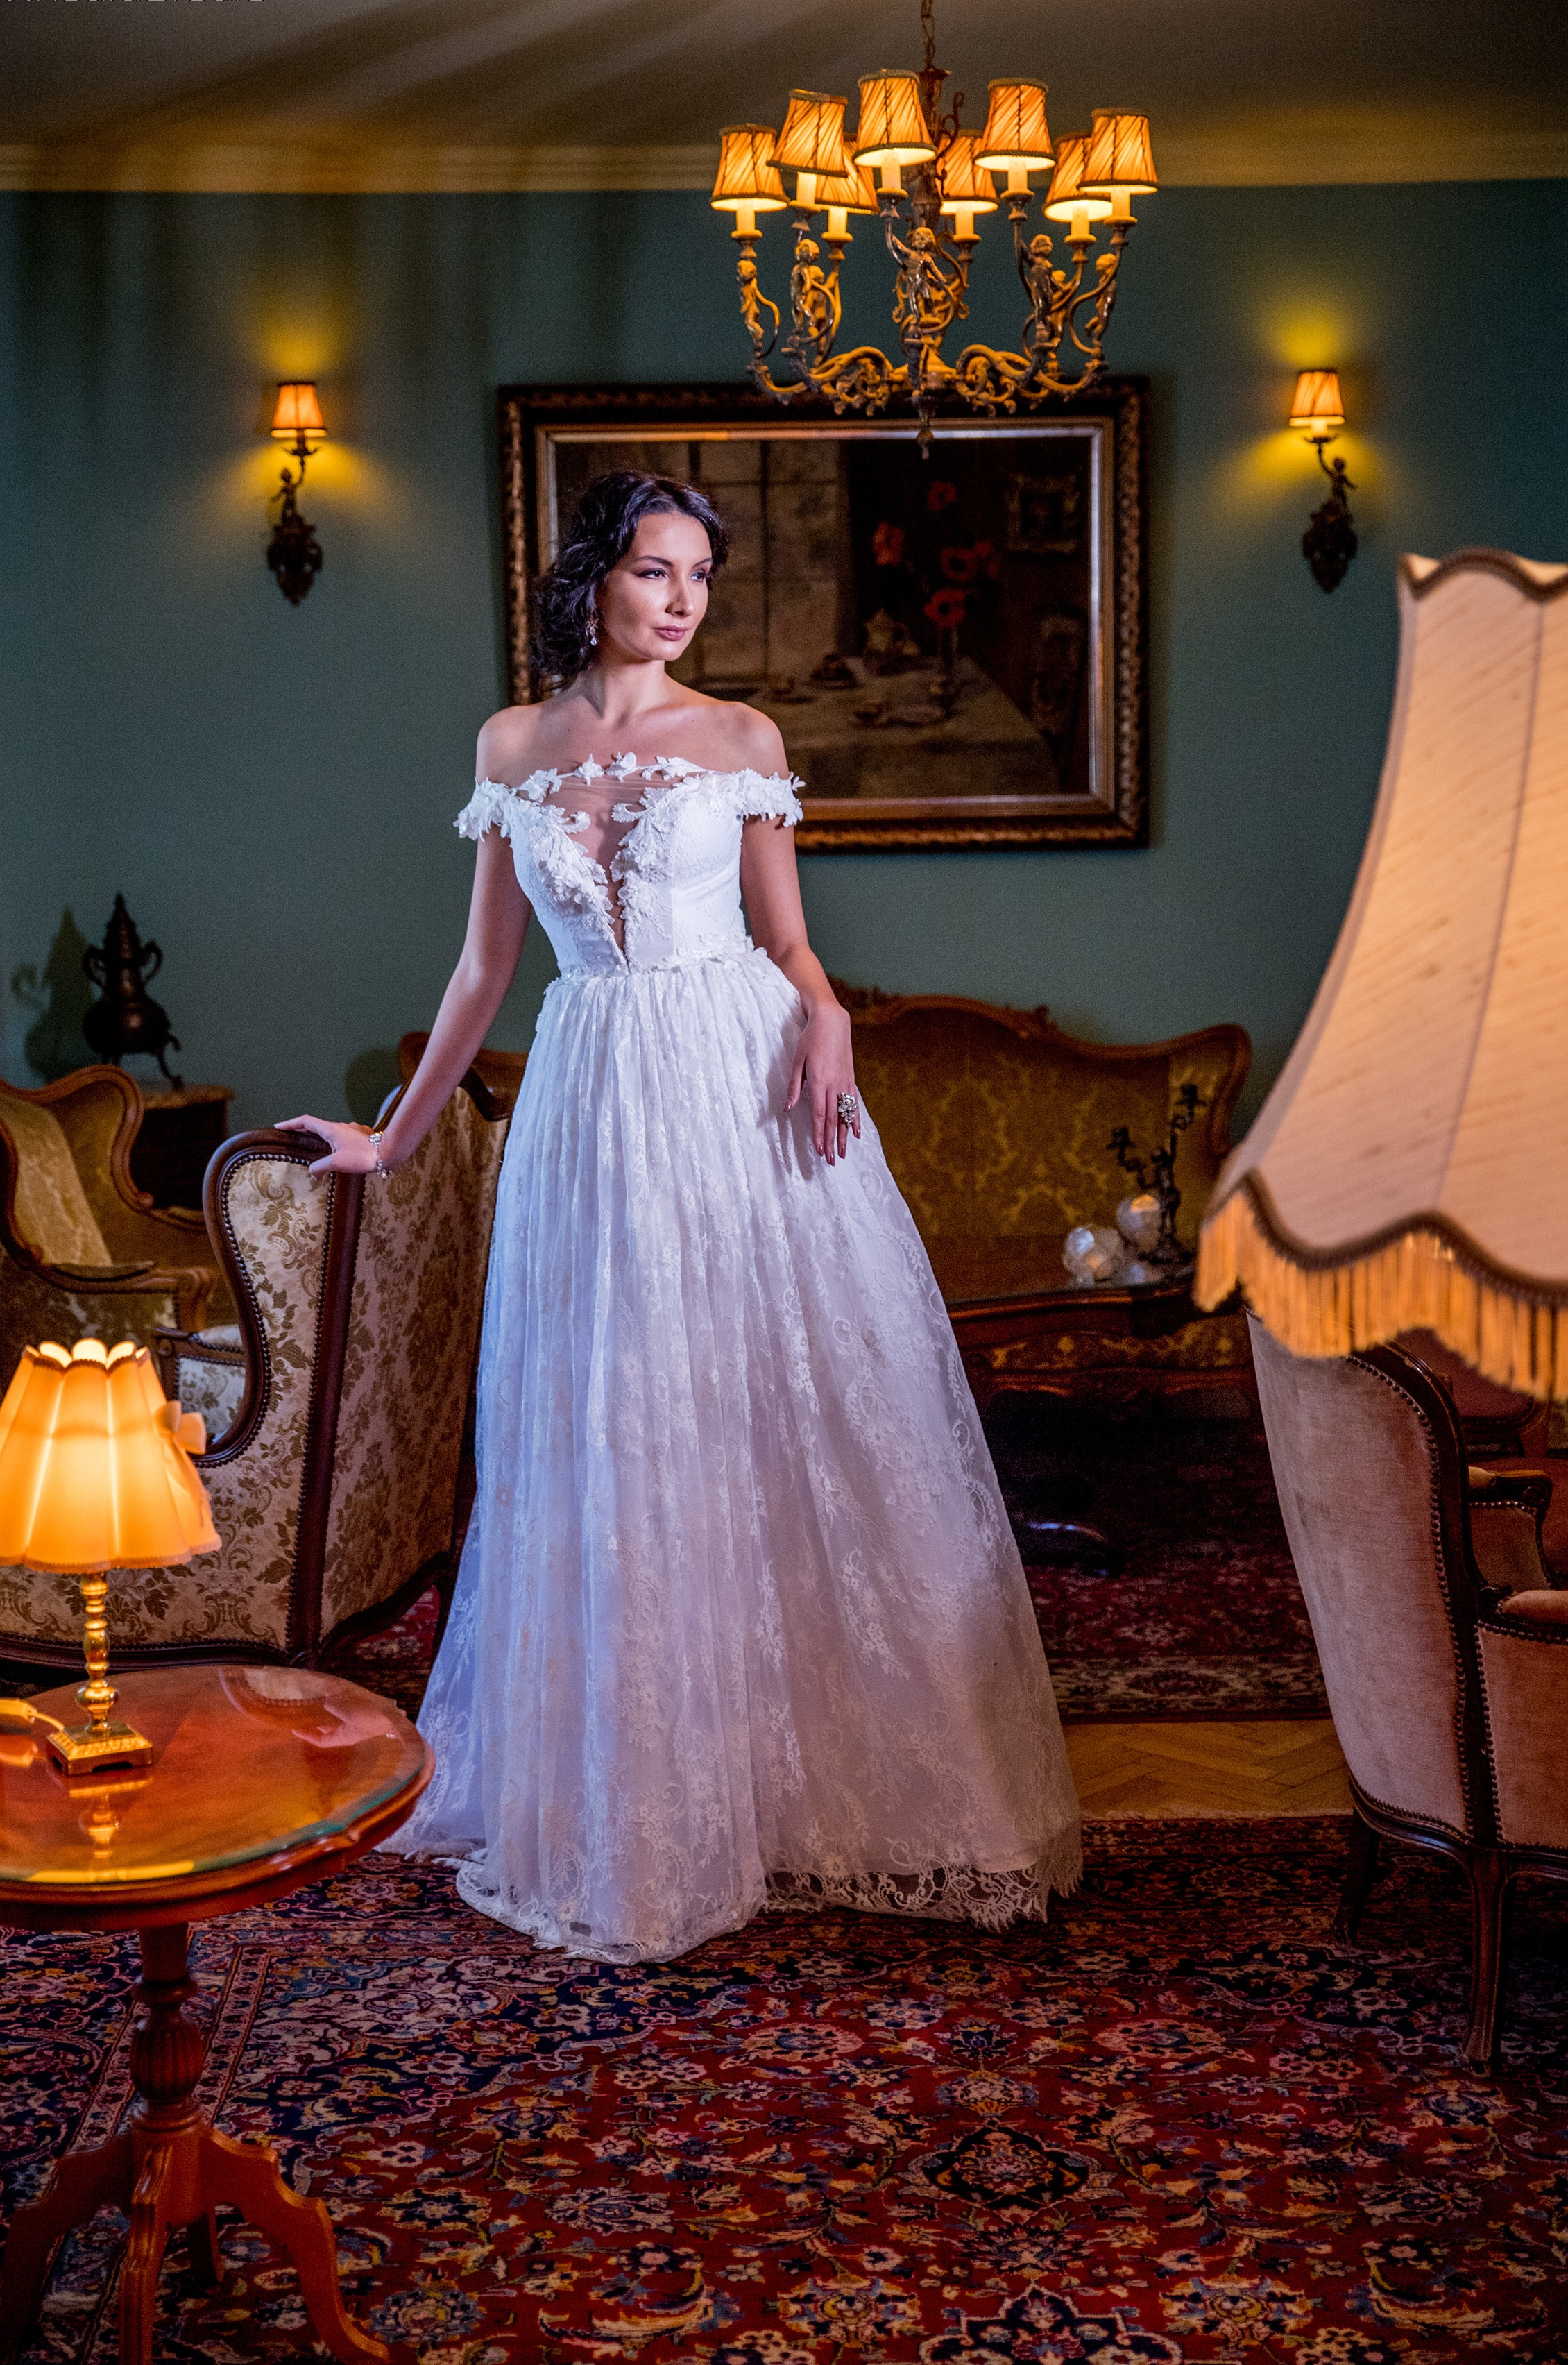 2018 wedding dresses fashion by laina (54).jpg